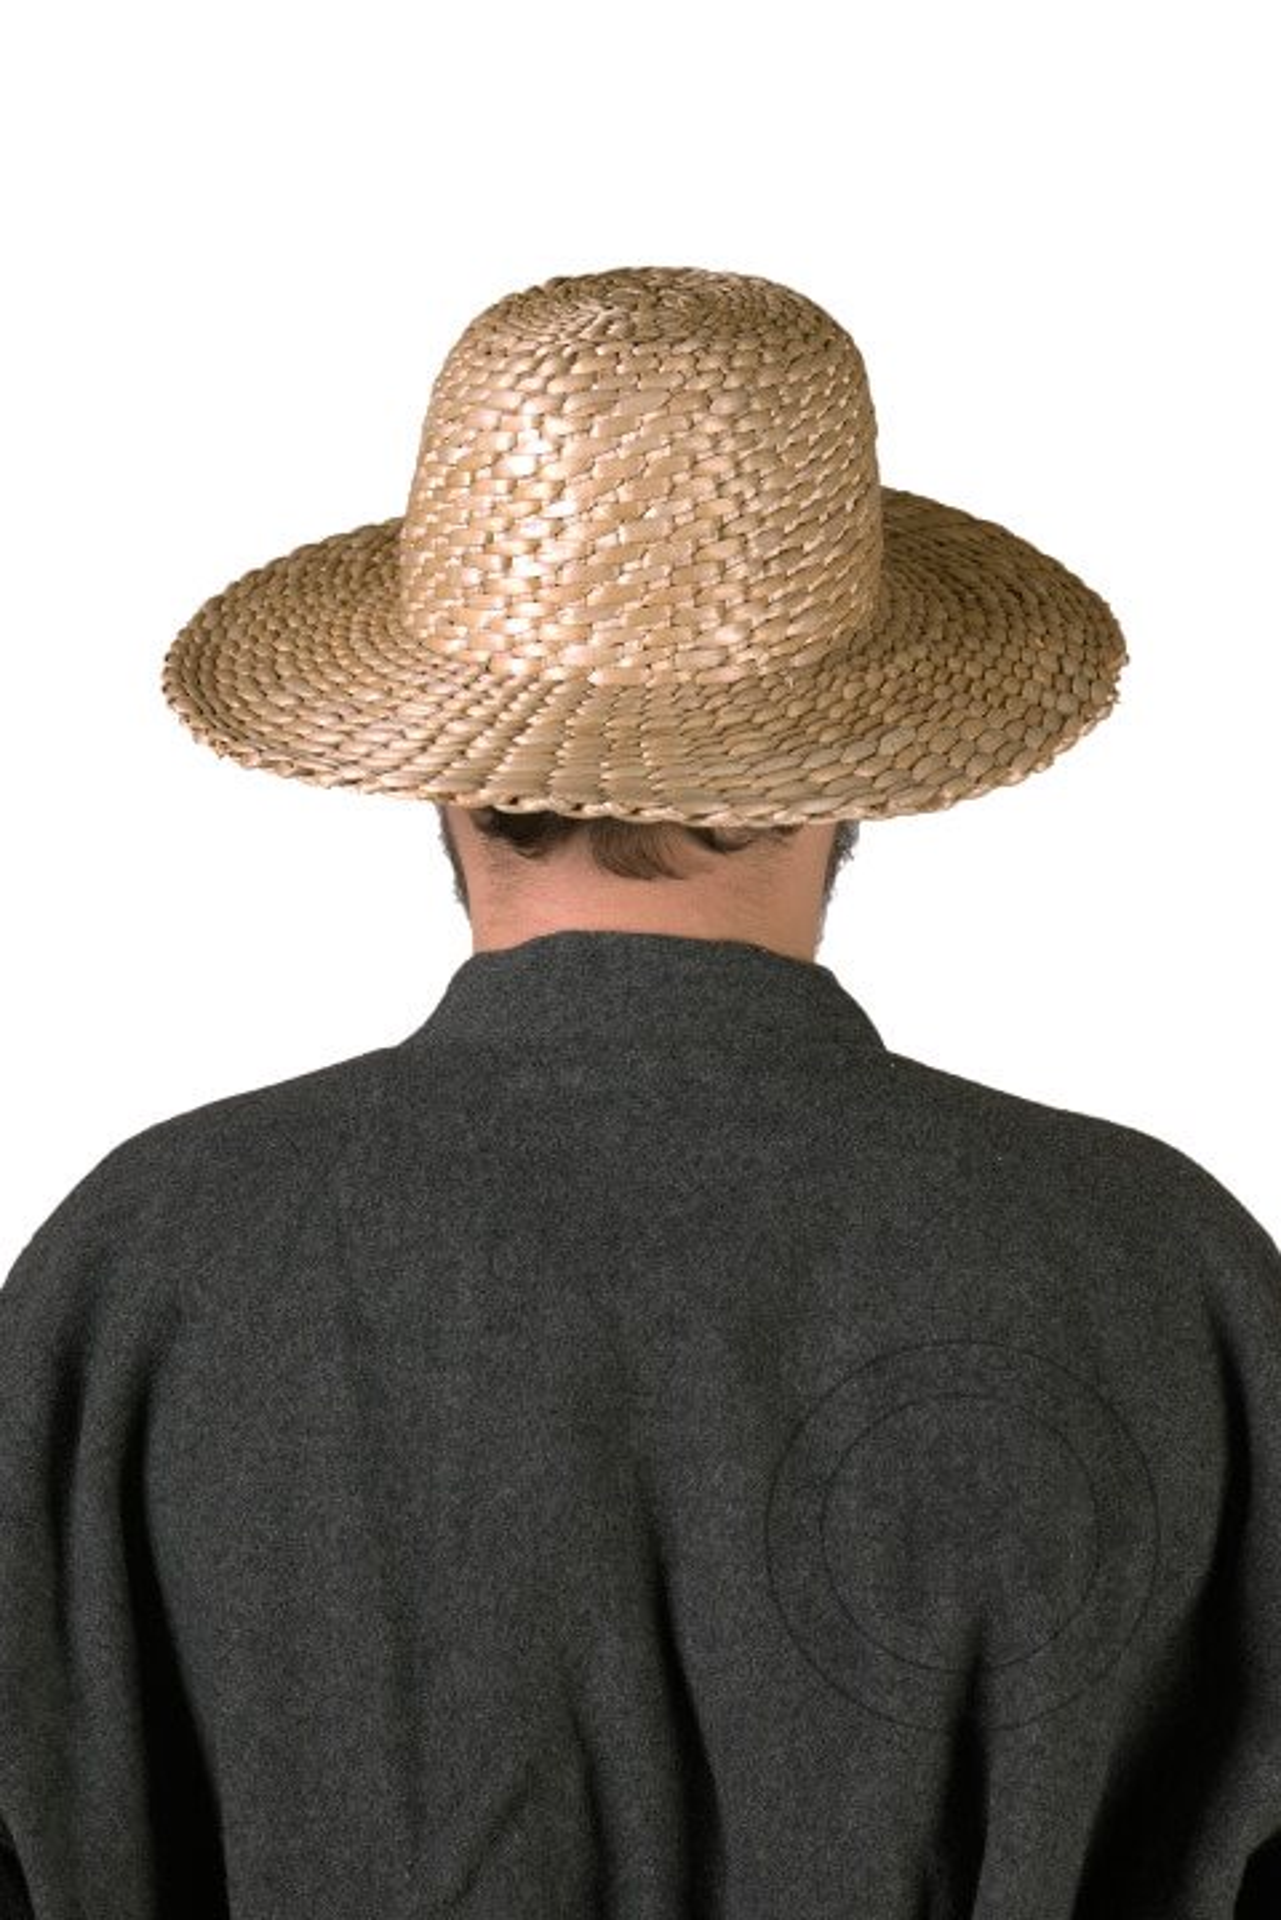 Straw Hat Type 1 MEDIEVAL MARKET SPES